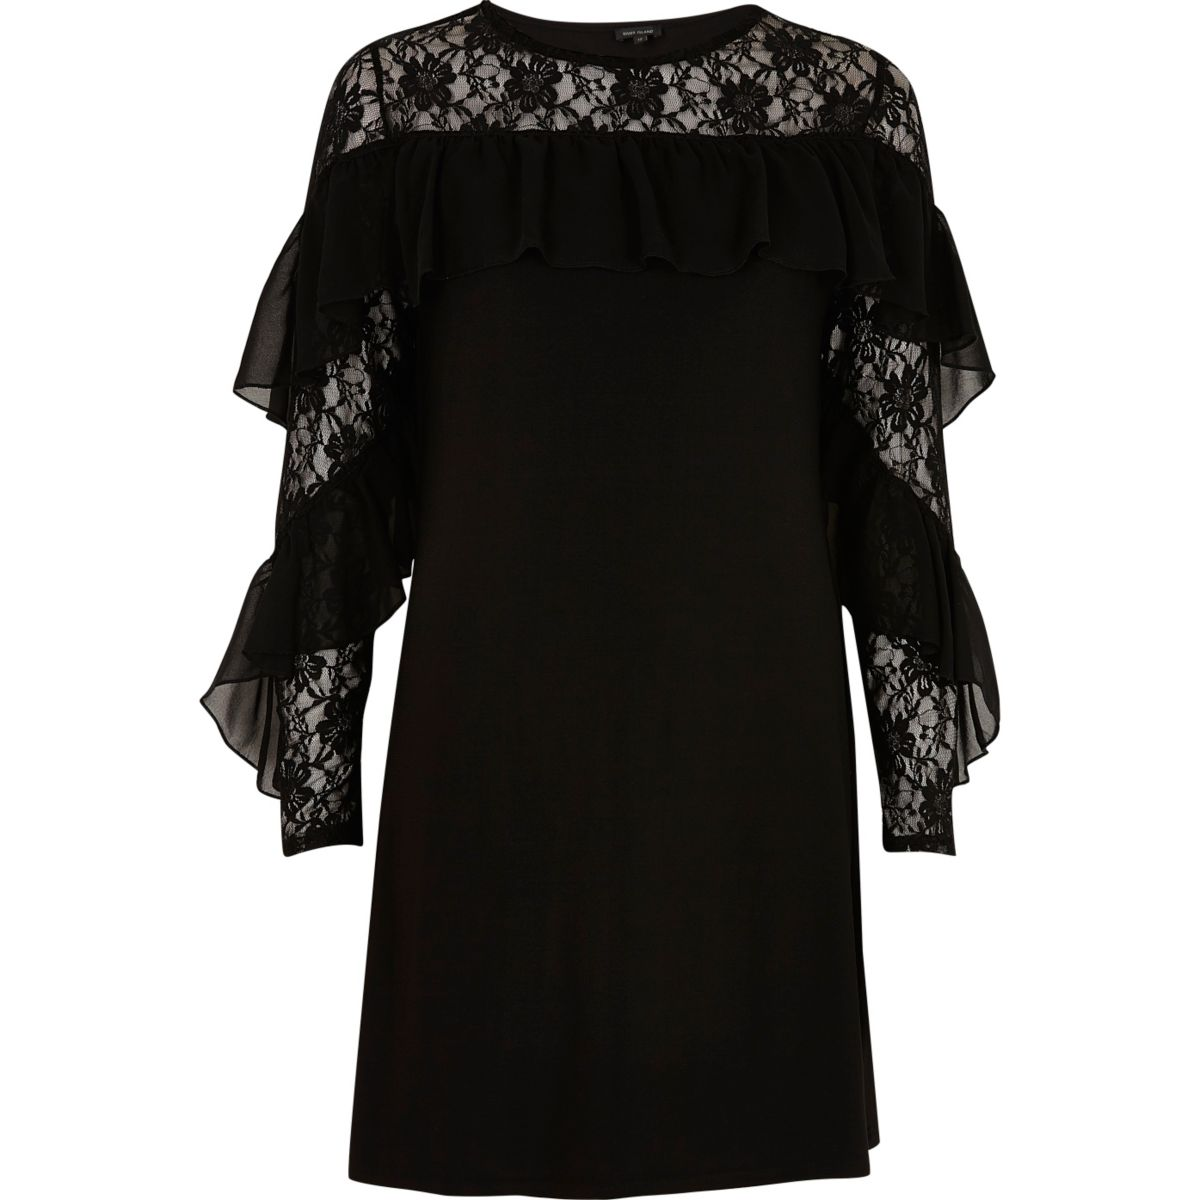 Black lace frill sleeve dress